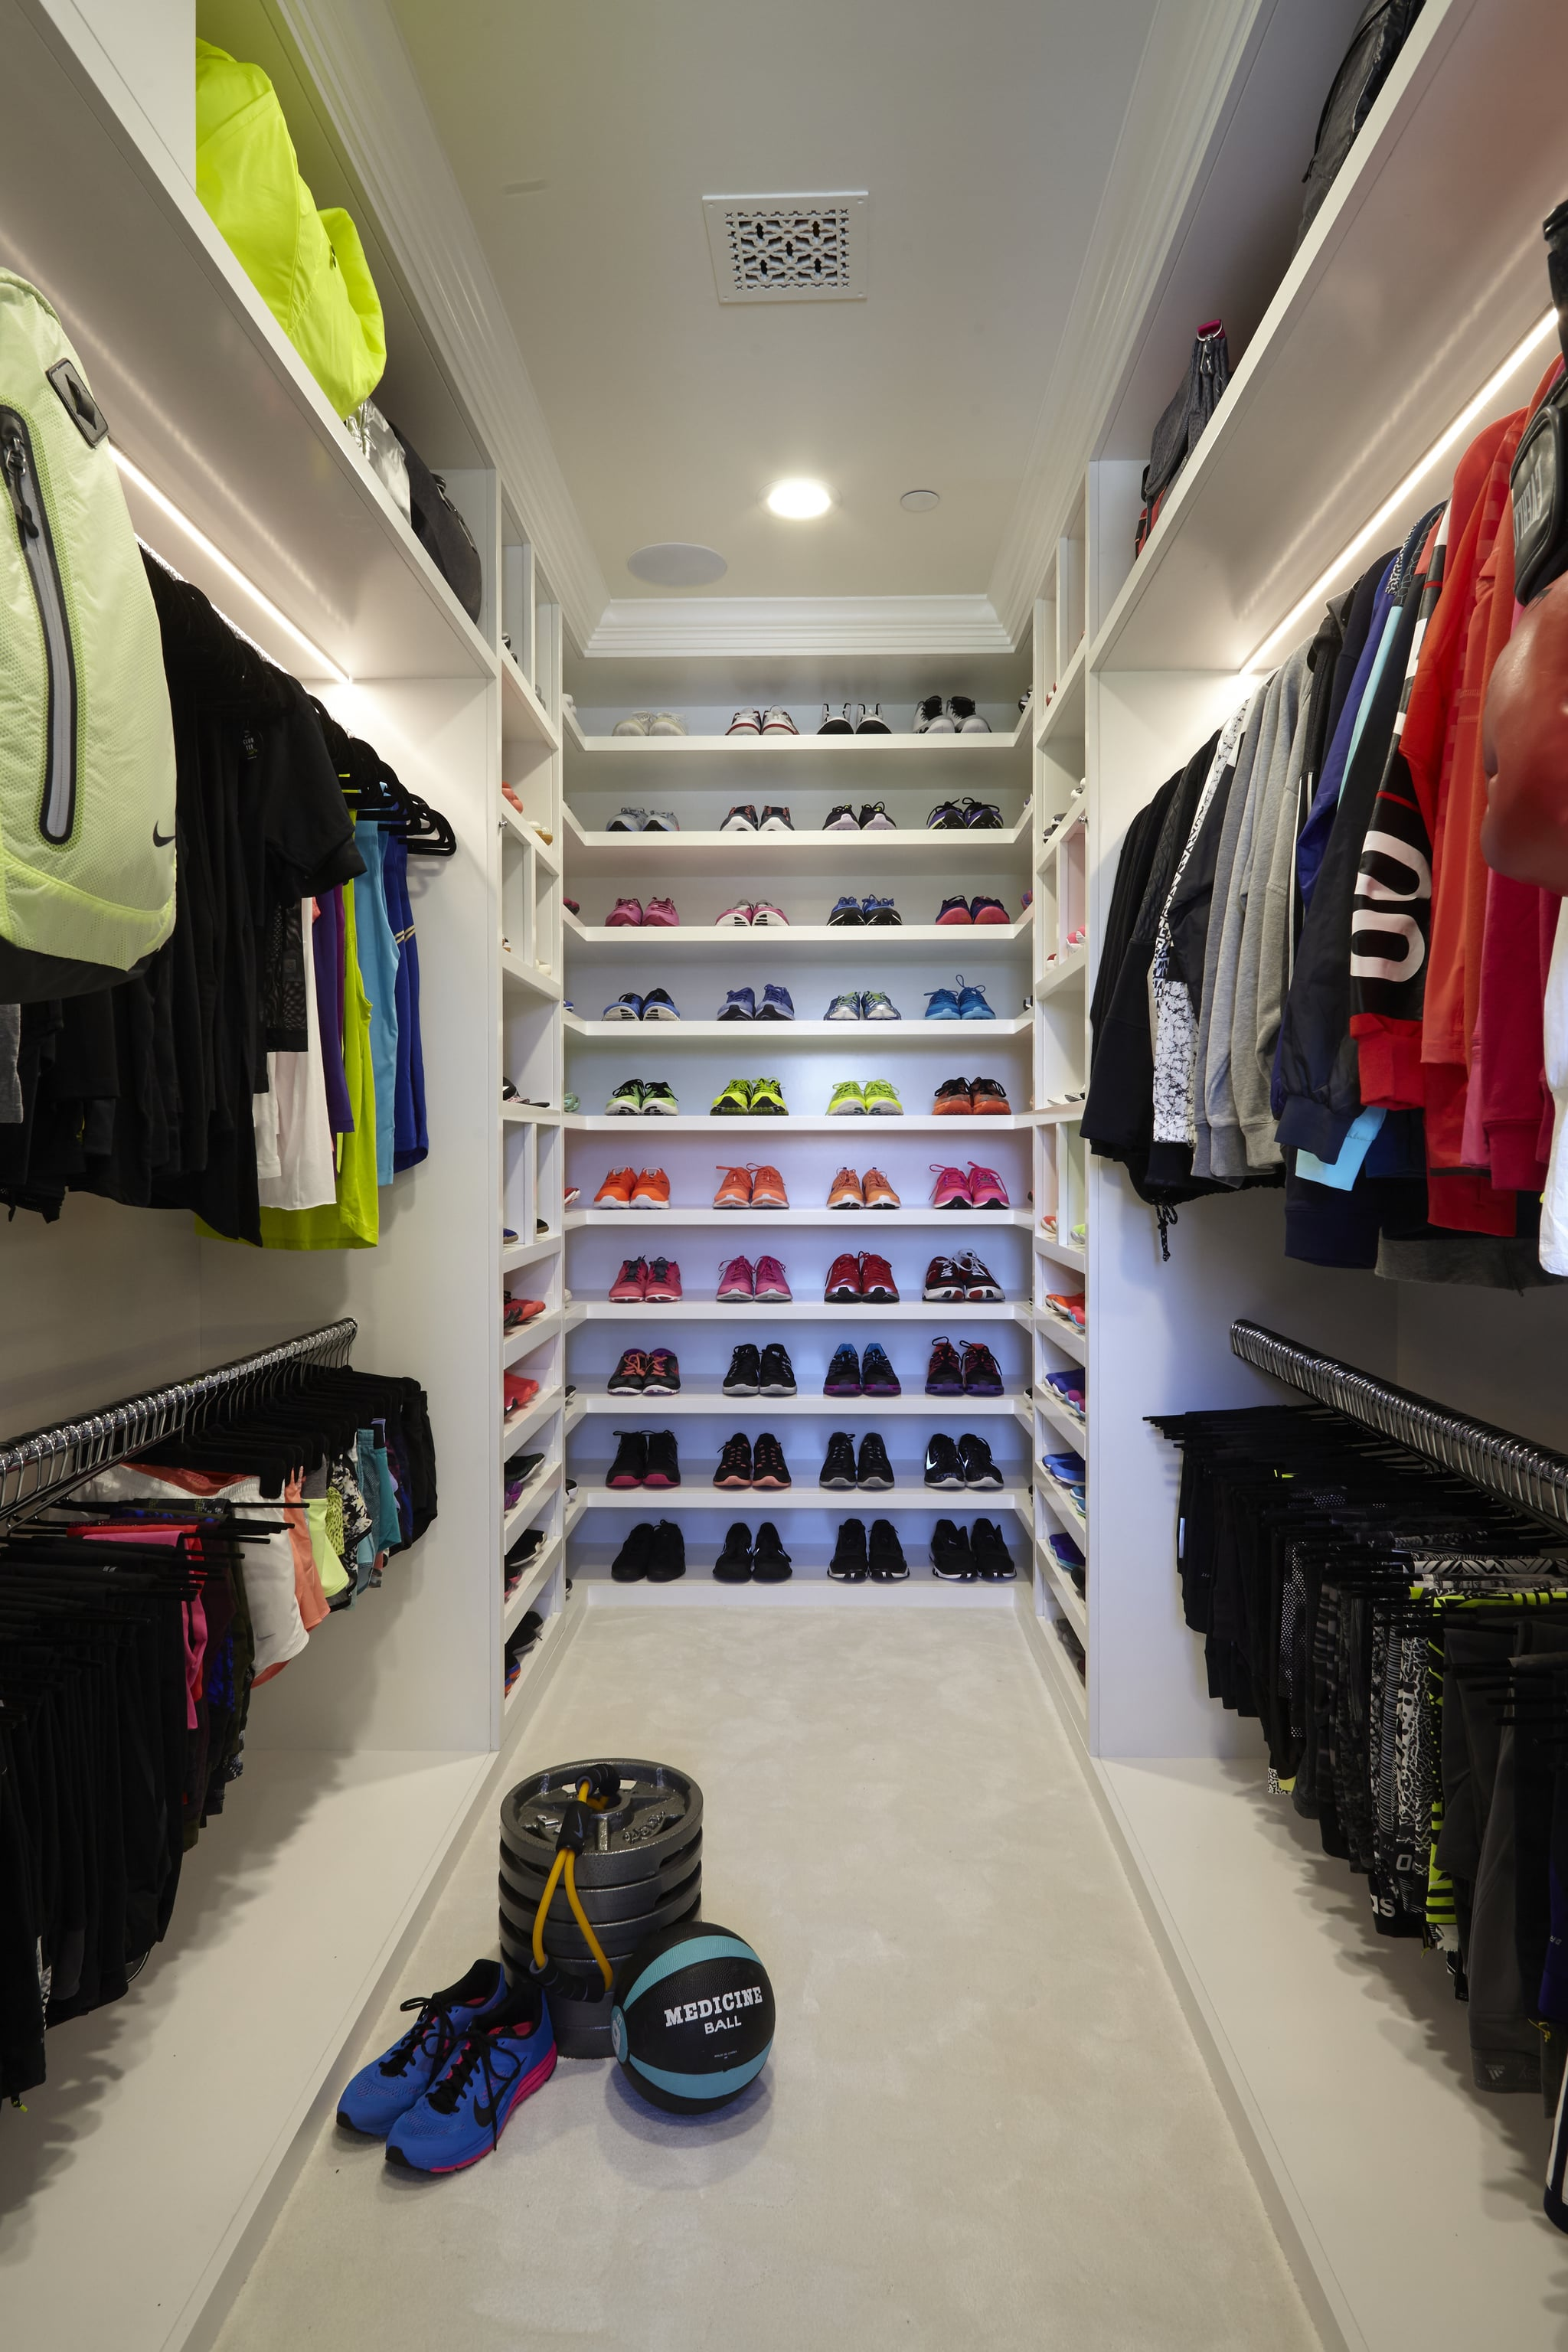 Khloe Kardashian Workout Shoe Collection